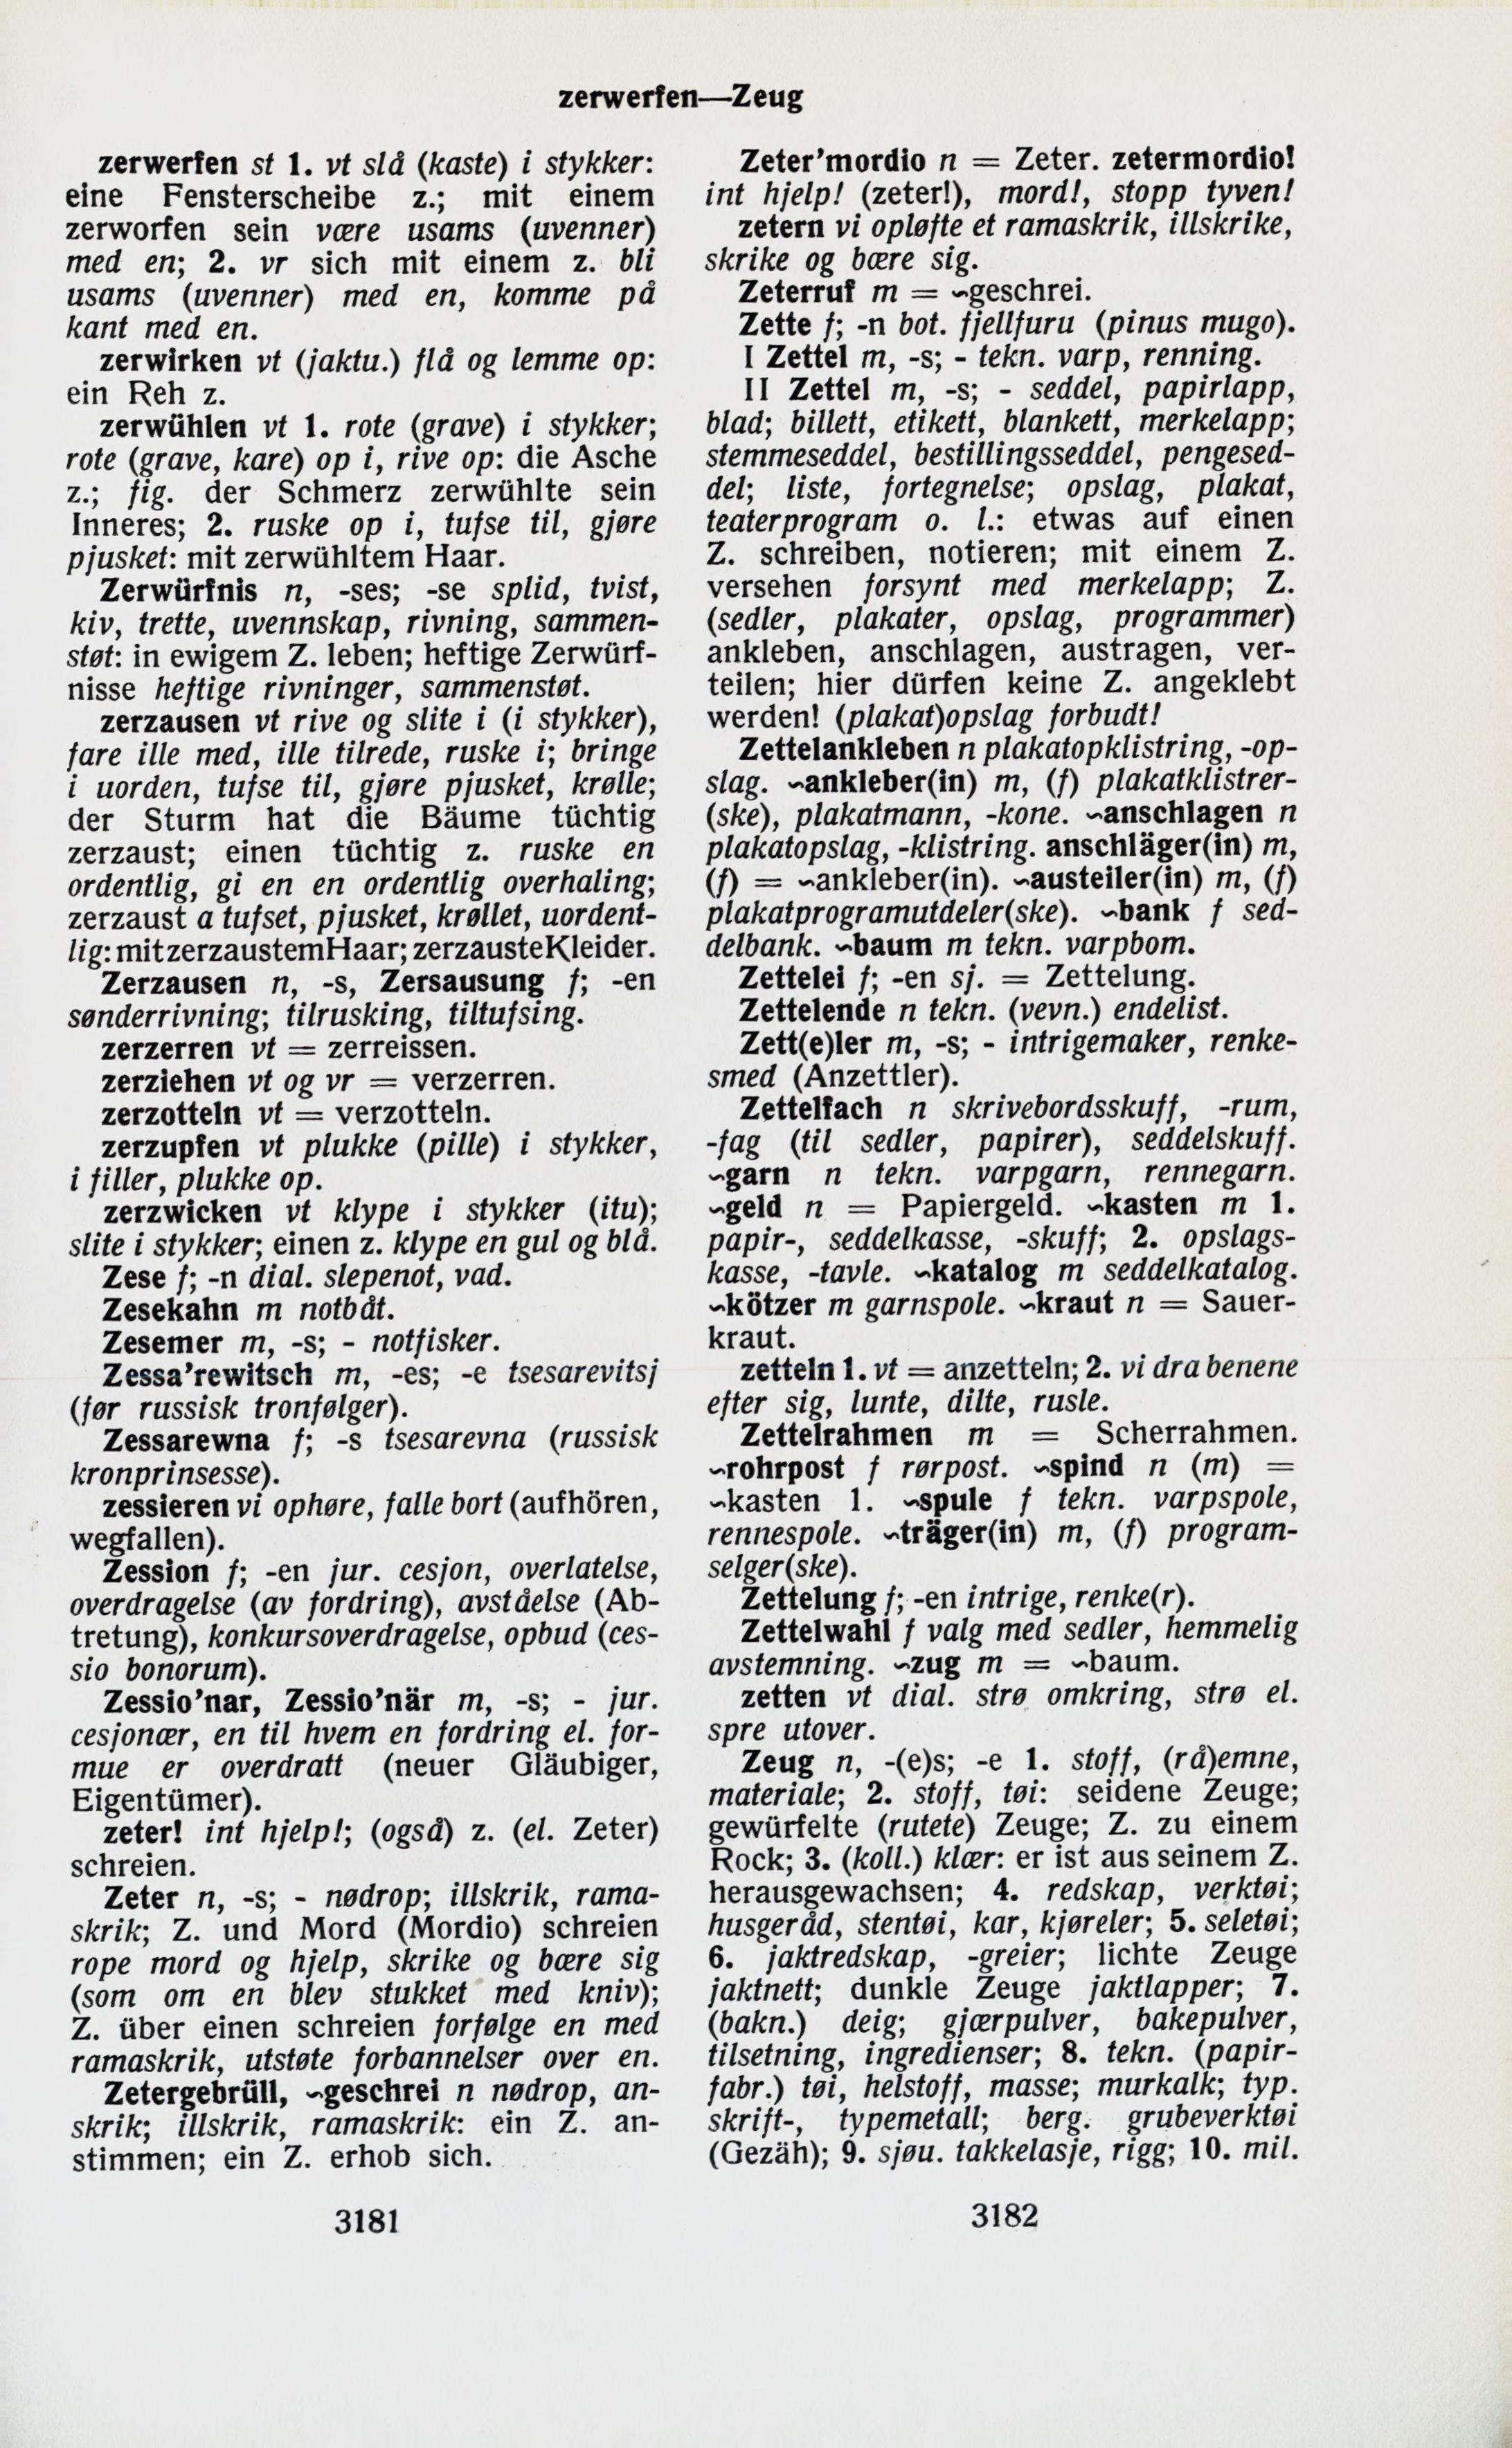 3181-3182 (Tysk-norsk ordbok)